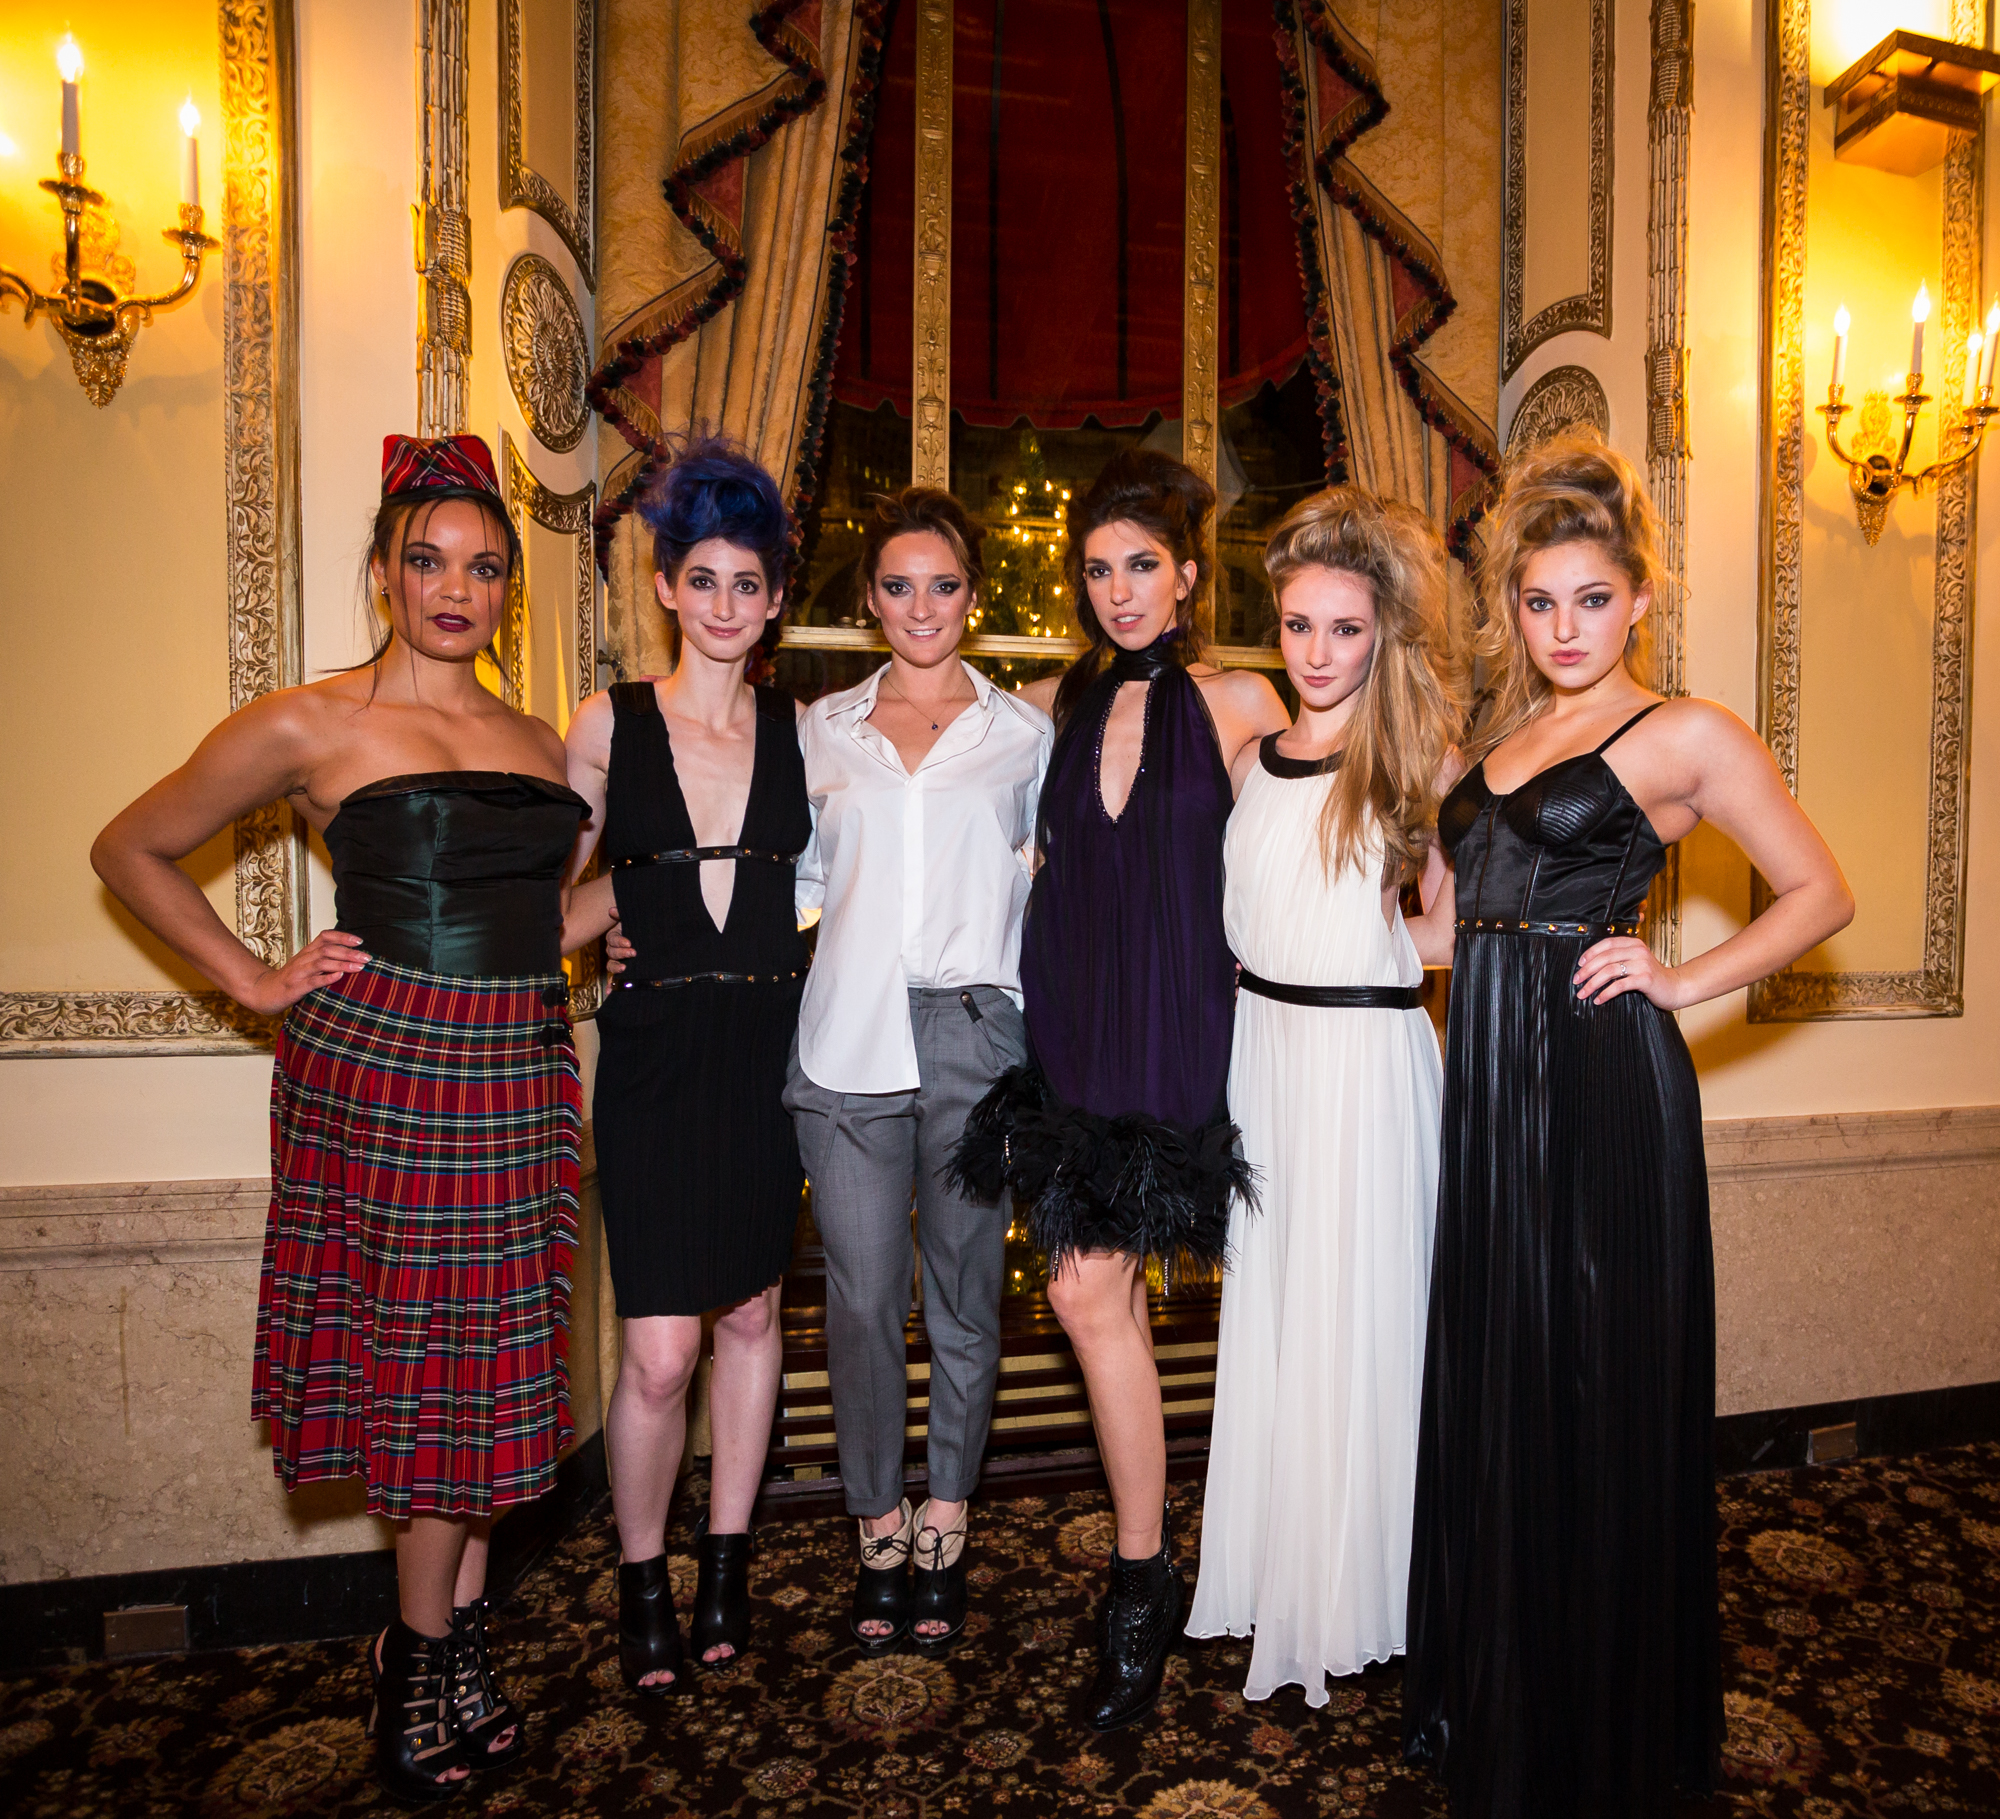 Left, Renee Avi Gadsden, Geena Matuson (@geenamatuson), Chynna Pope, Renée Ricciardi, Jocelyn Kelley, Nicole Spiller in 'Scene&Style' fashion event.